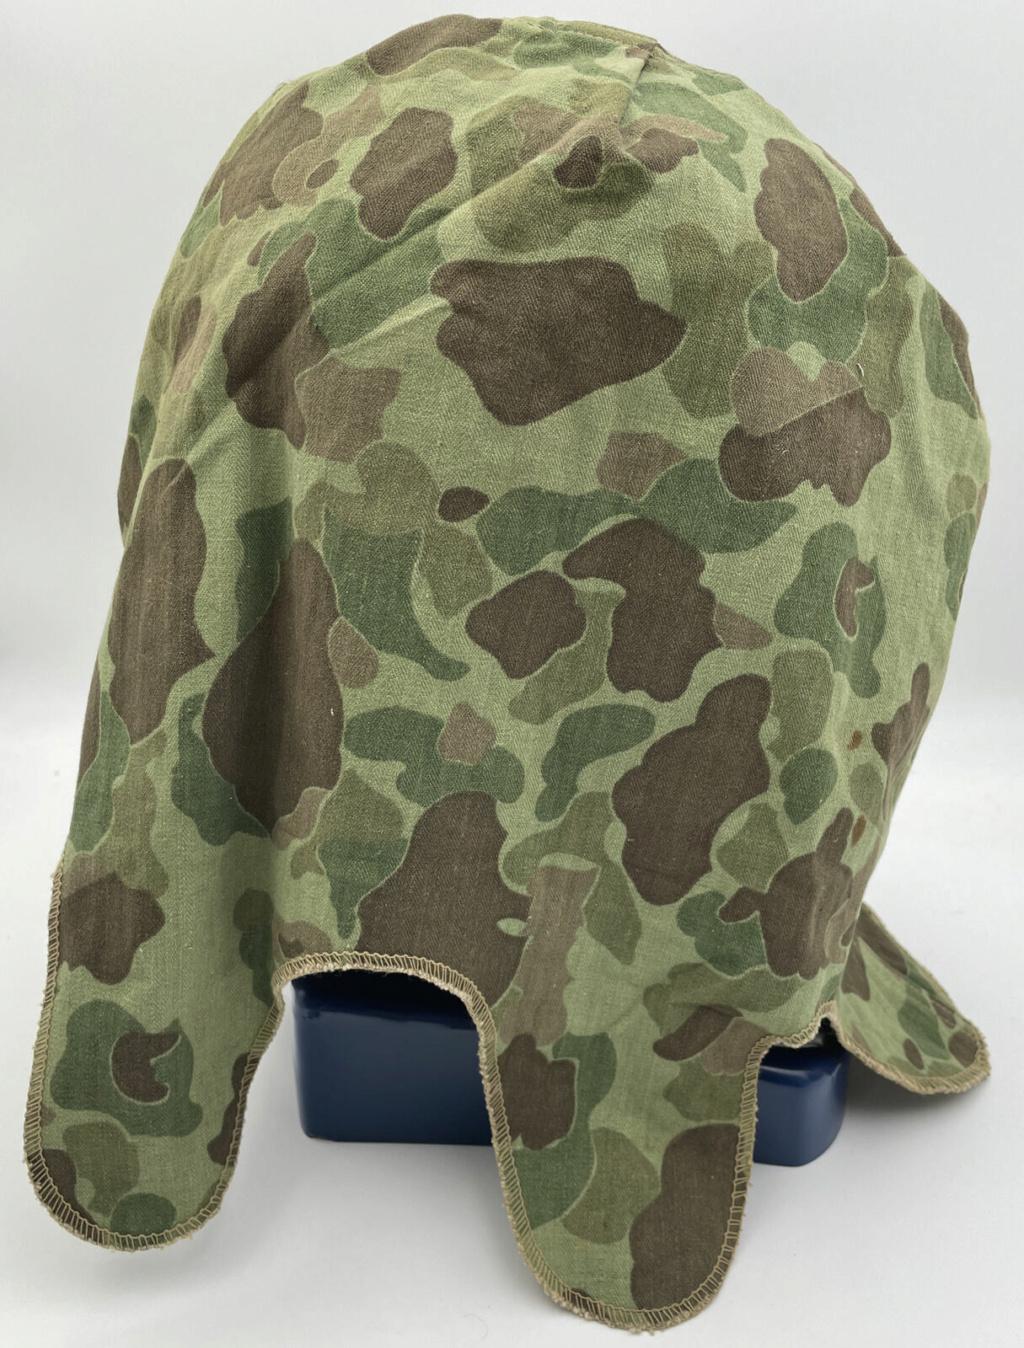 Couvre-casque USMC 243